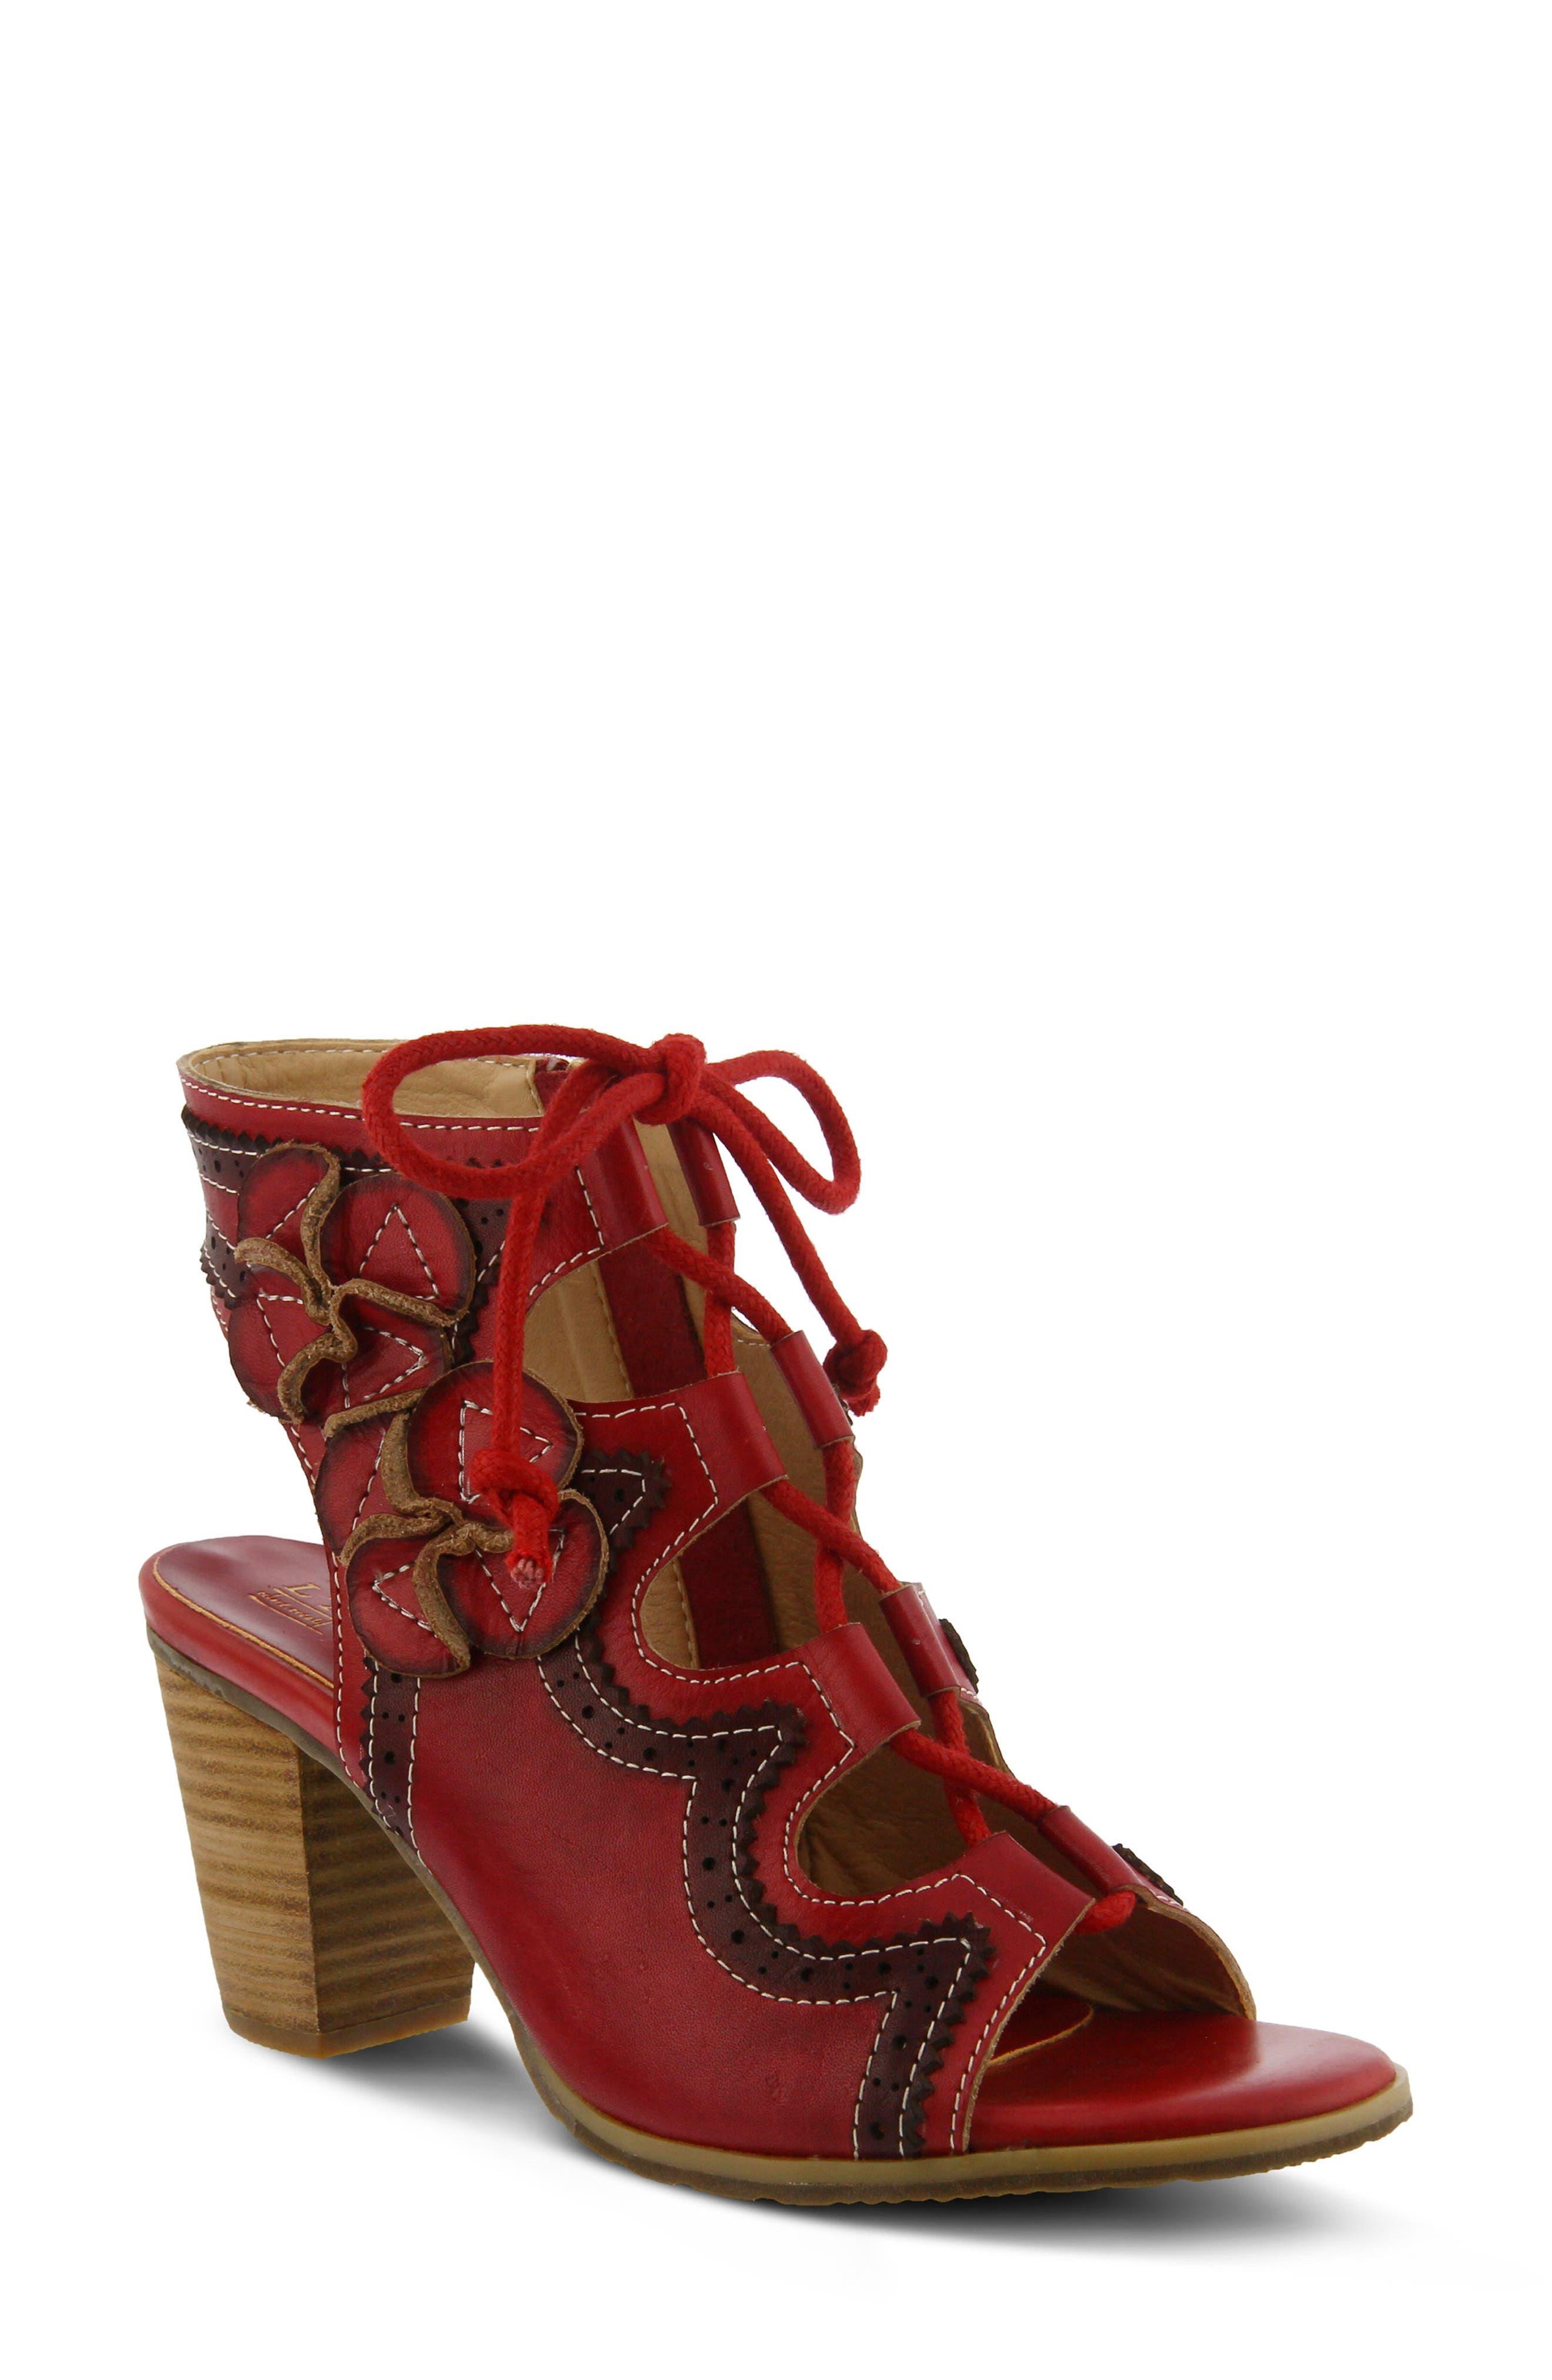 L'Artiste Alejandra Sandal,                             Main thumbnail 1, color,                             Red Leather